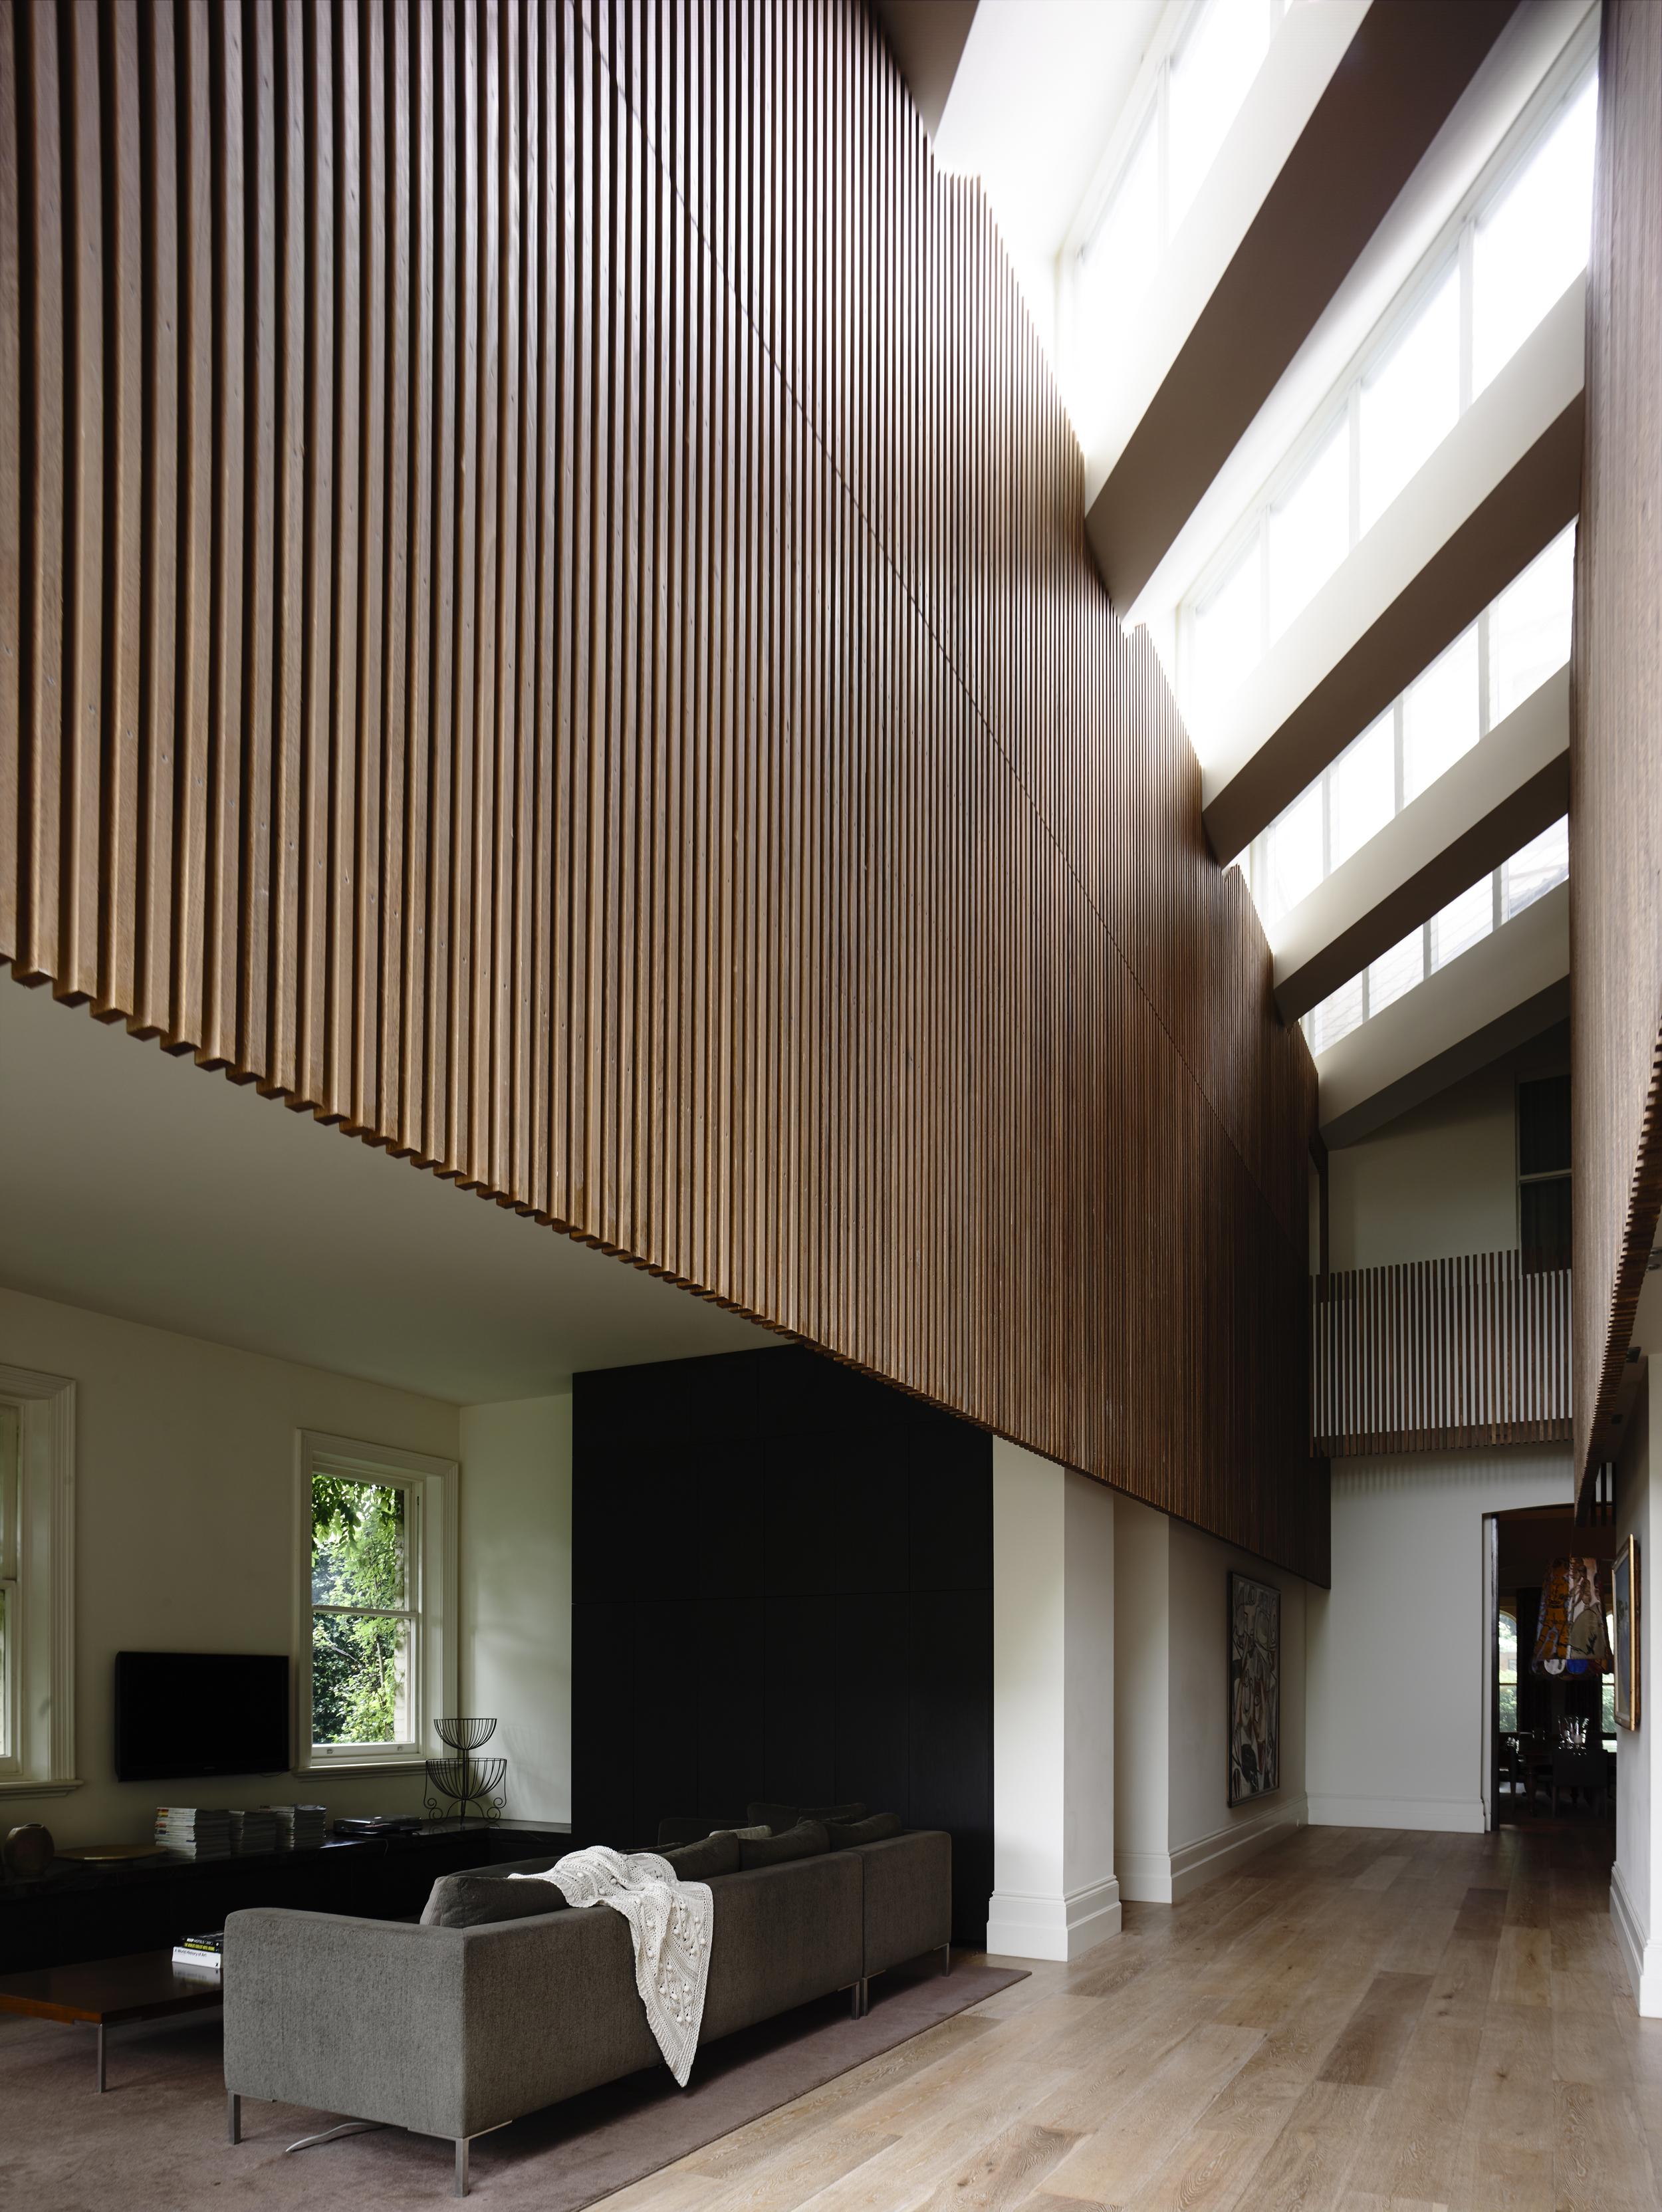 St Kilda house interior by Chamberlain Architects